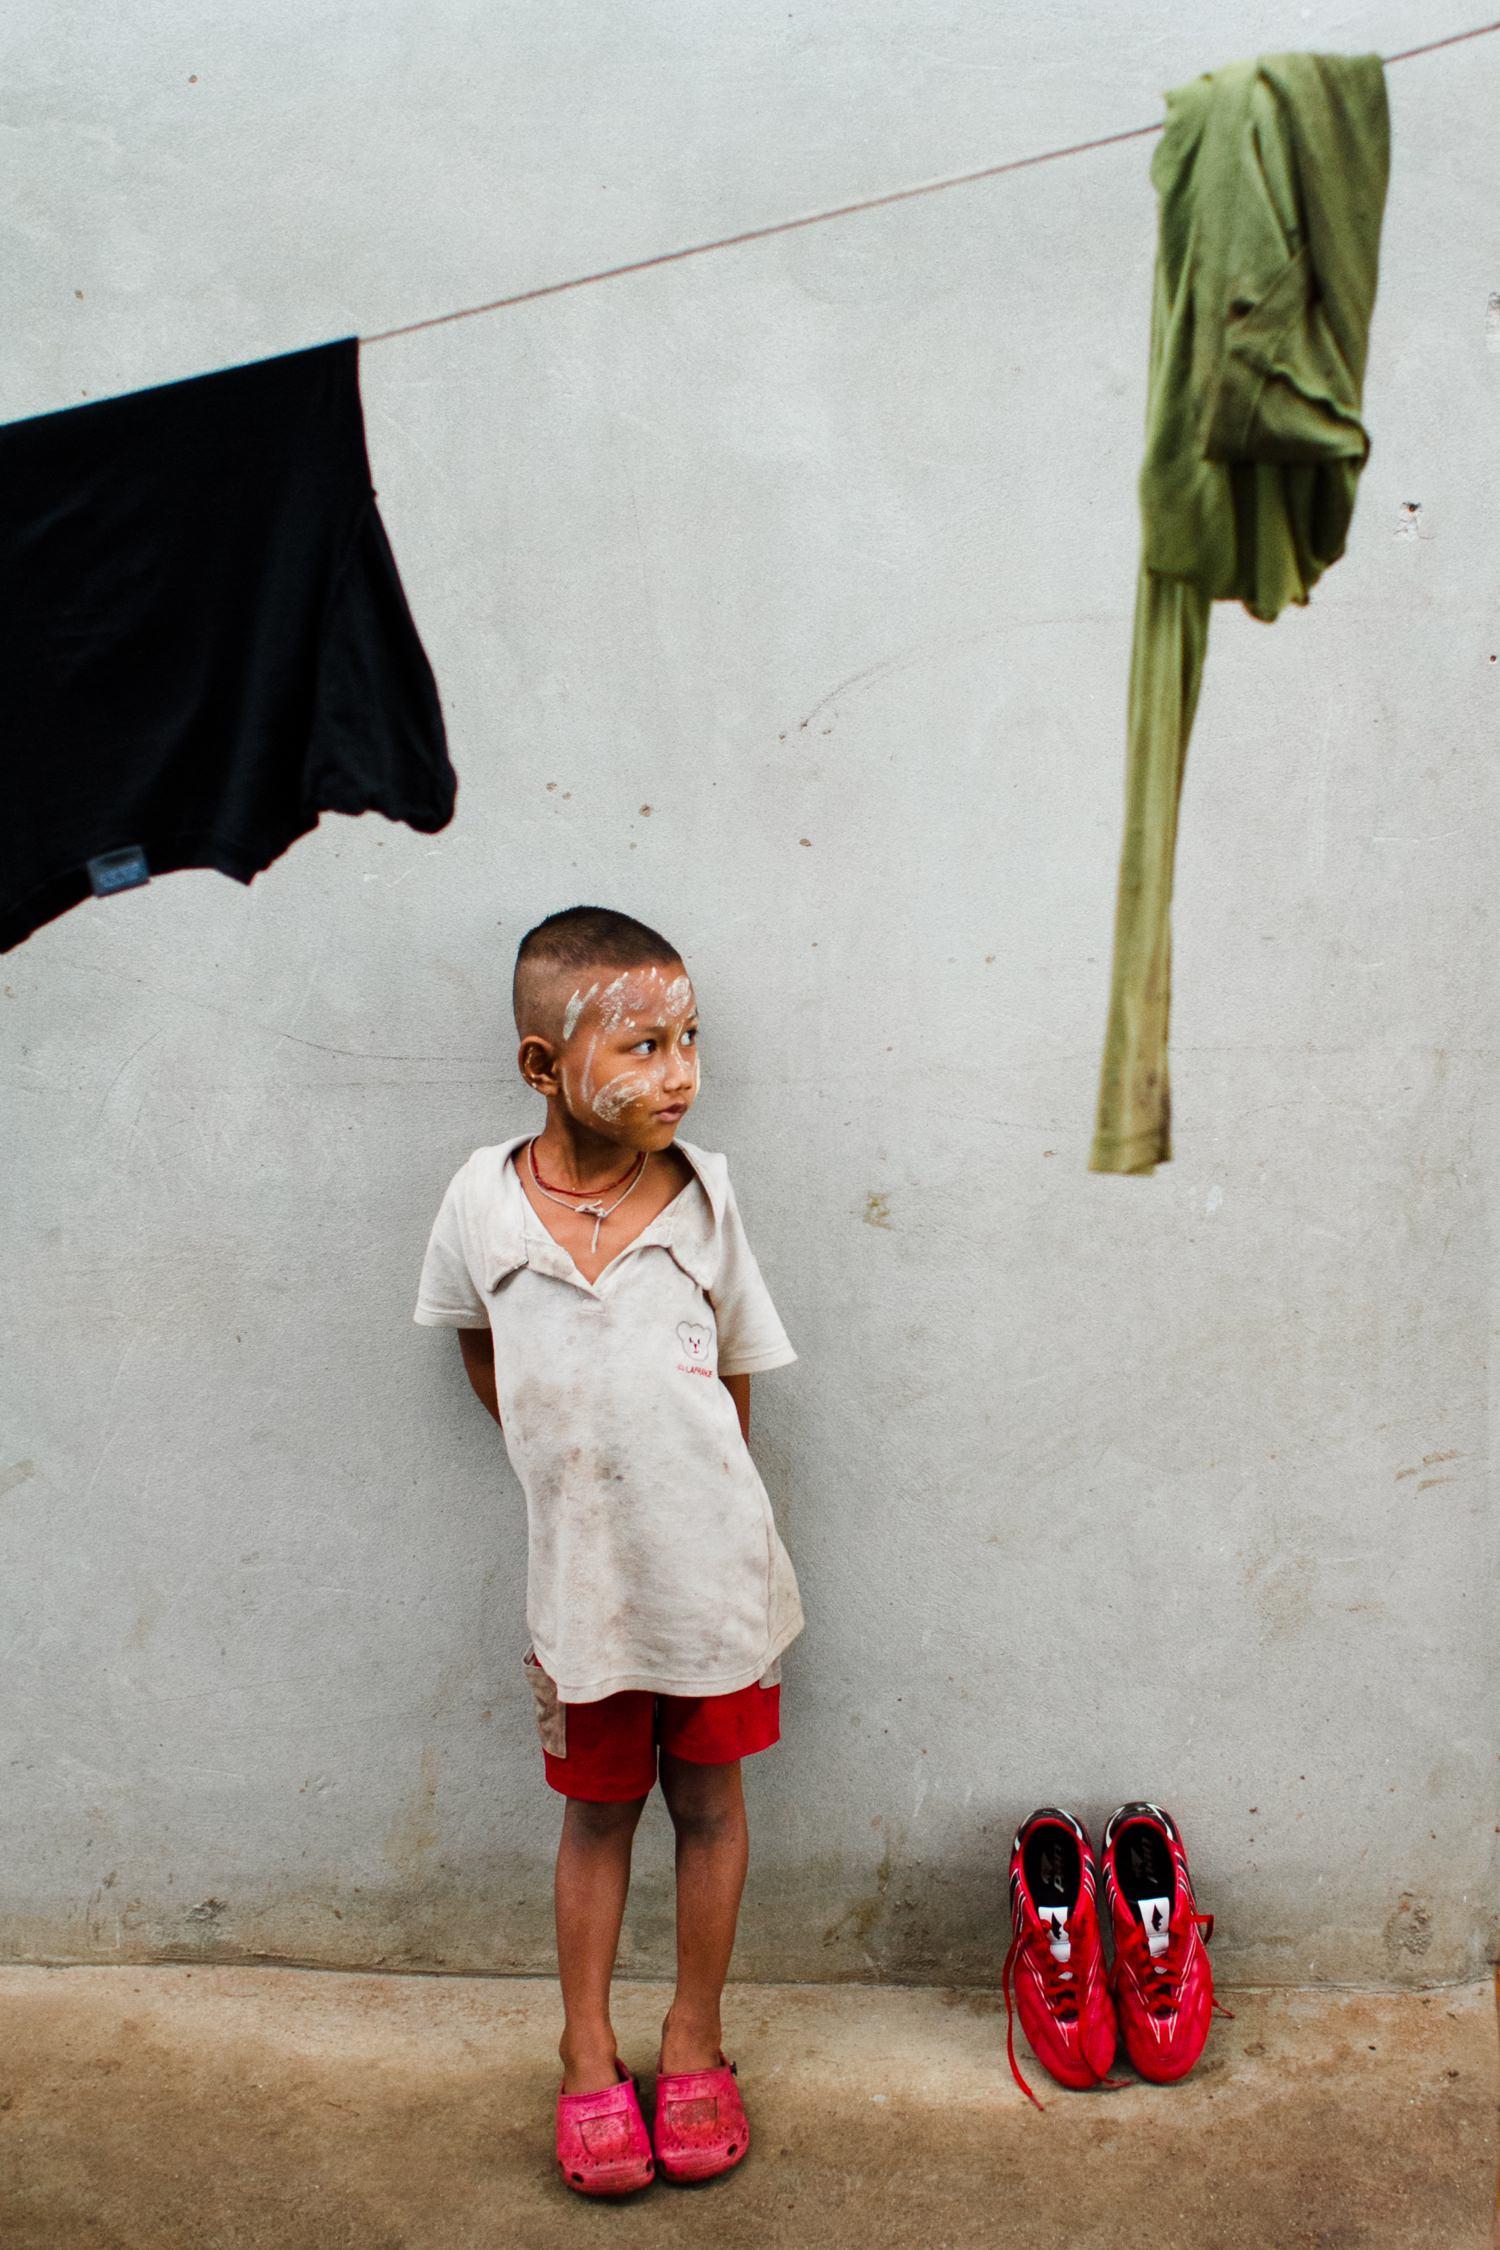 thailand-child-cameron-zegers-travel-photographer.jpg